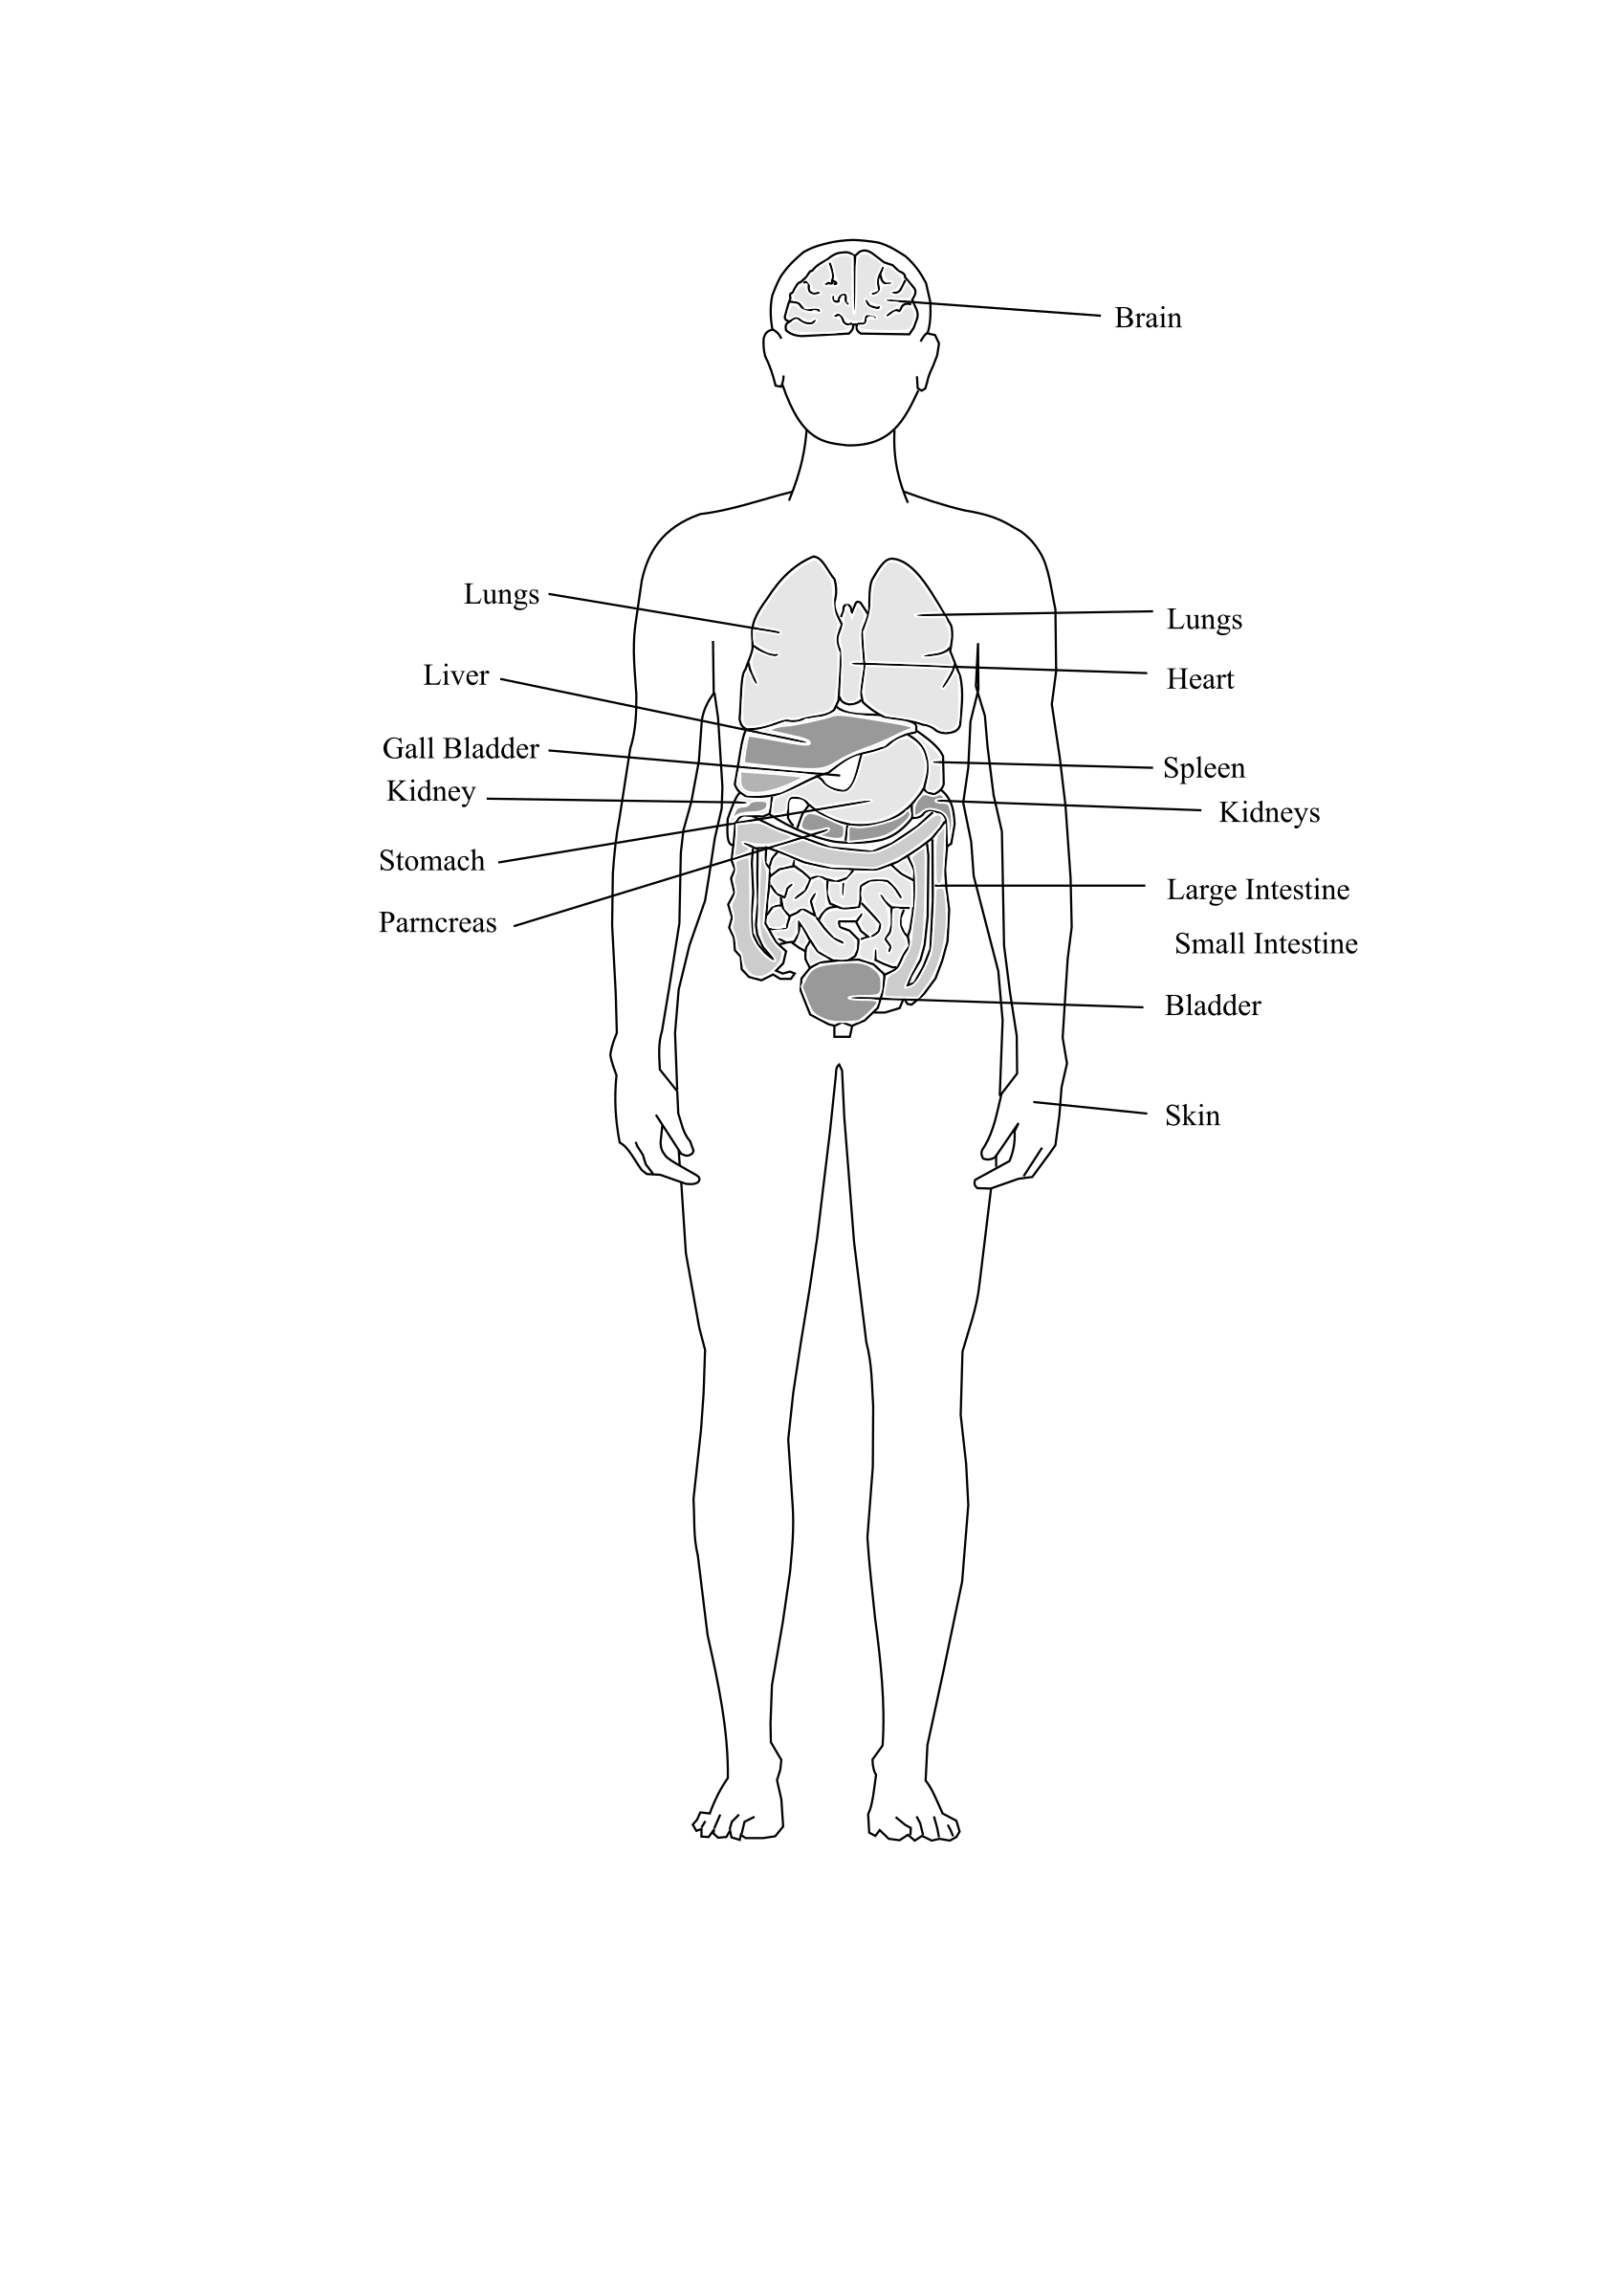 Human clipart human being, Human human being Transparent